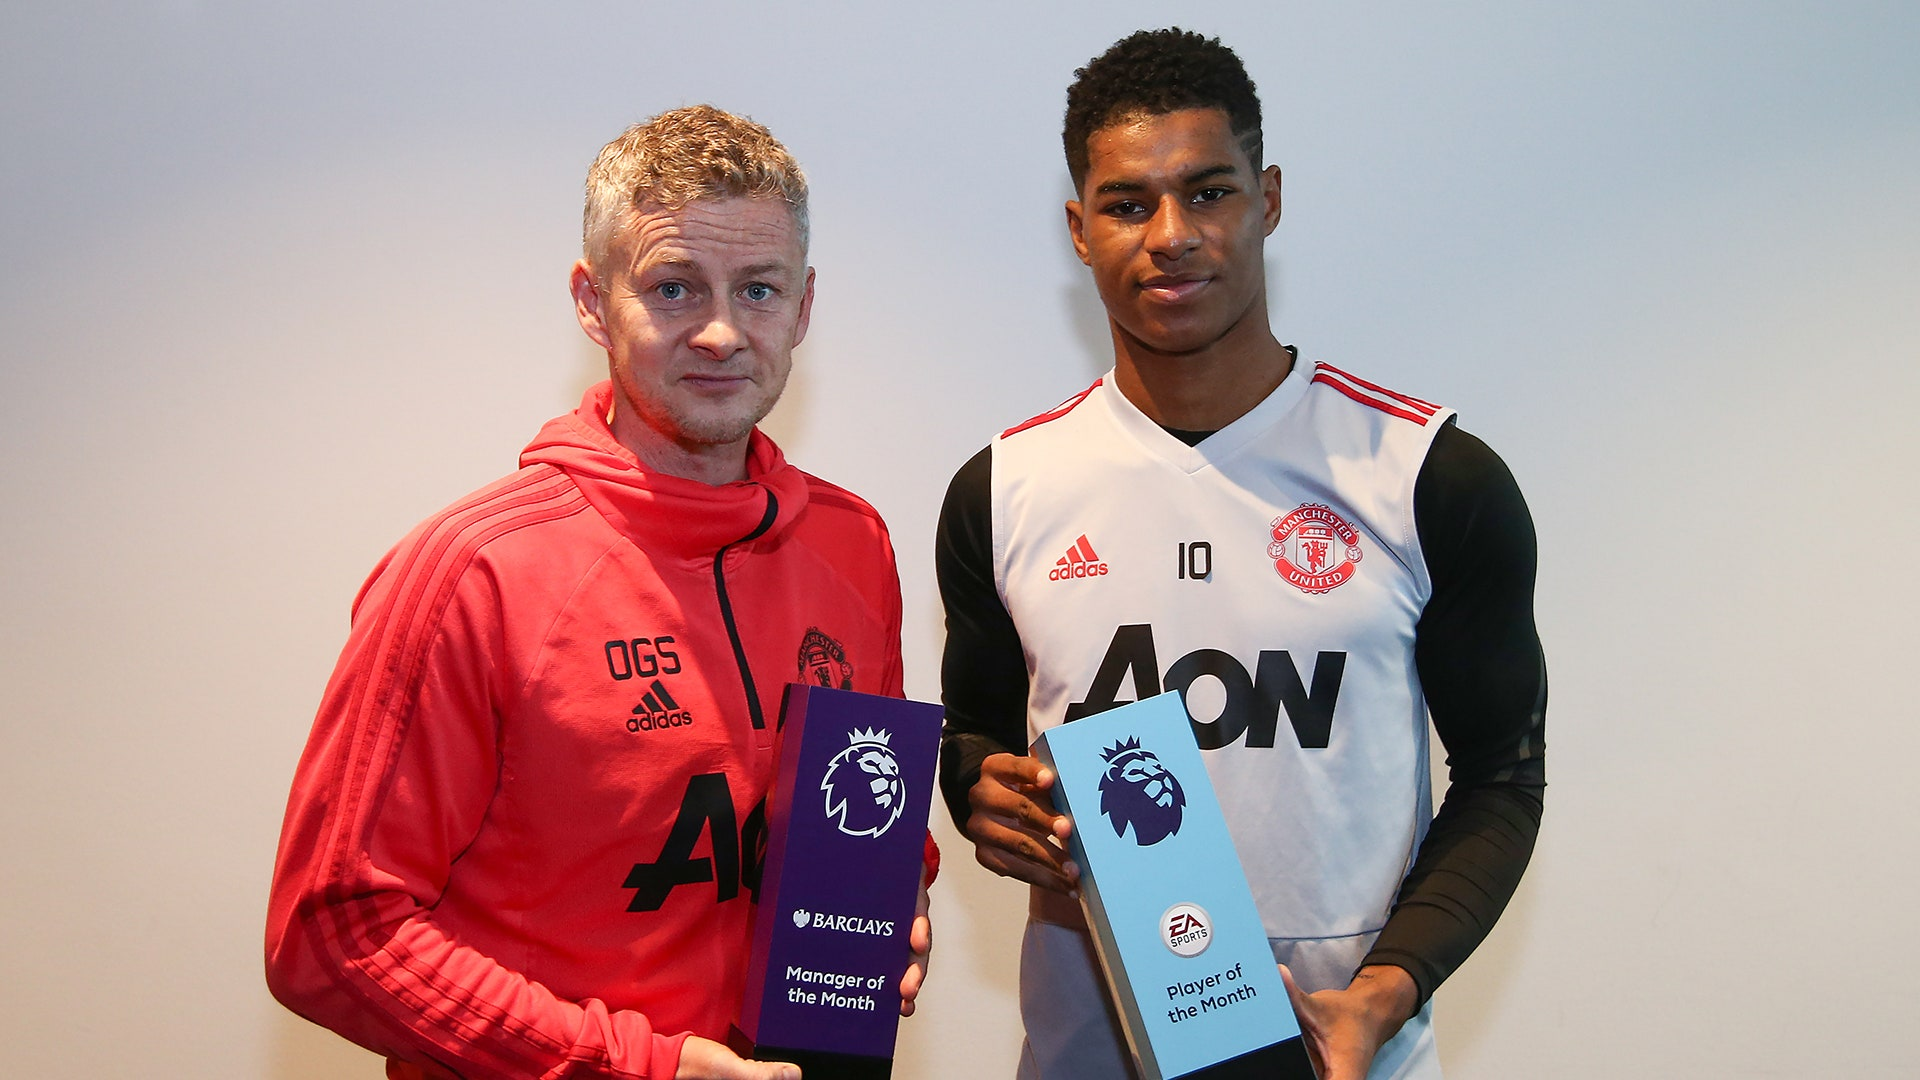 Mourinho borrowed Rashford to whirl Solskjaer - Photo 2.